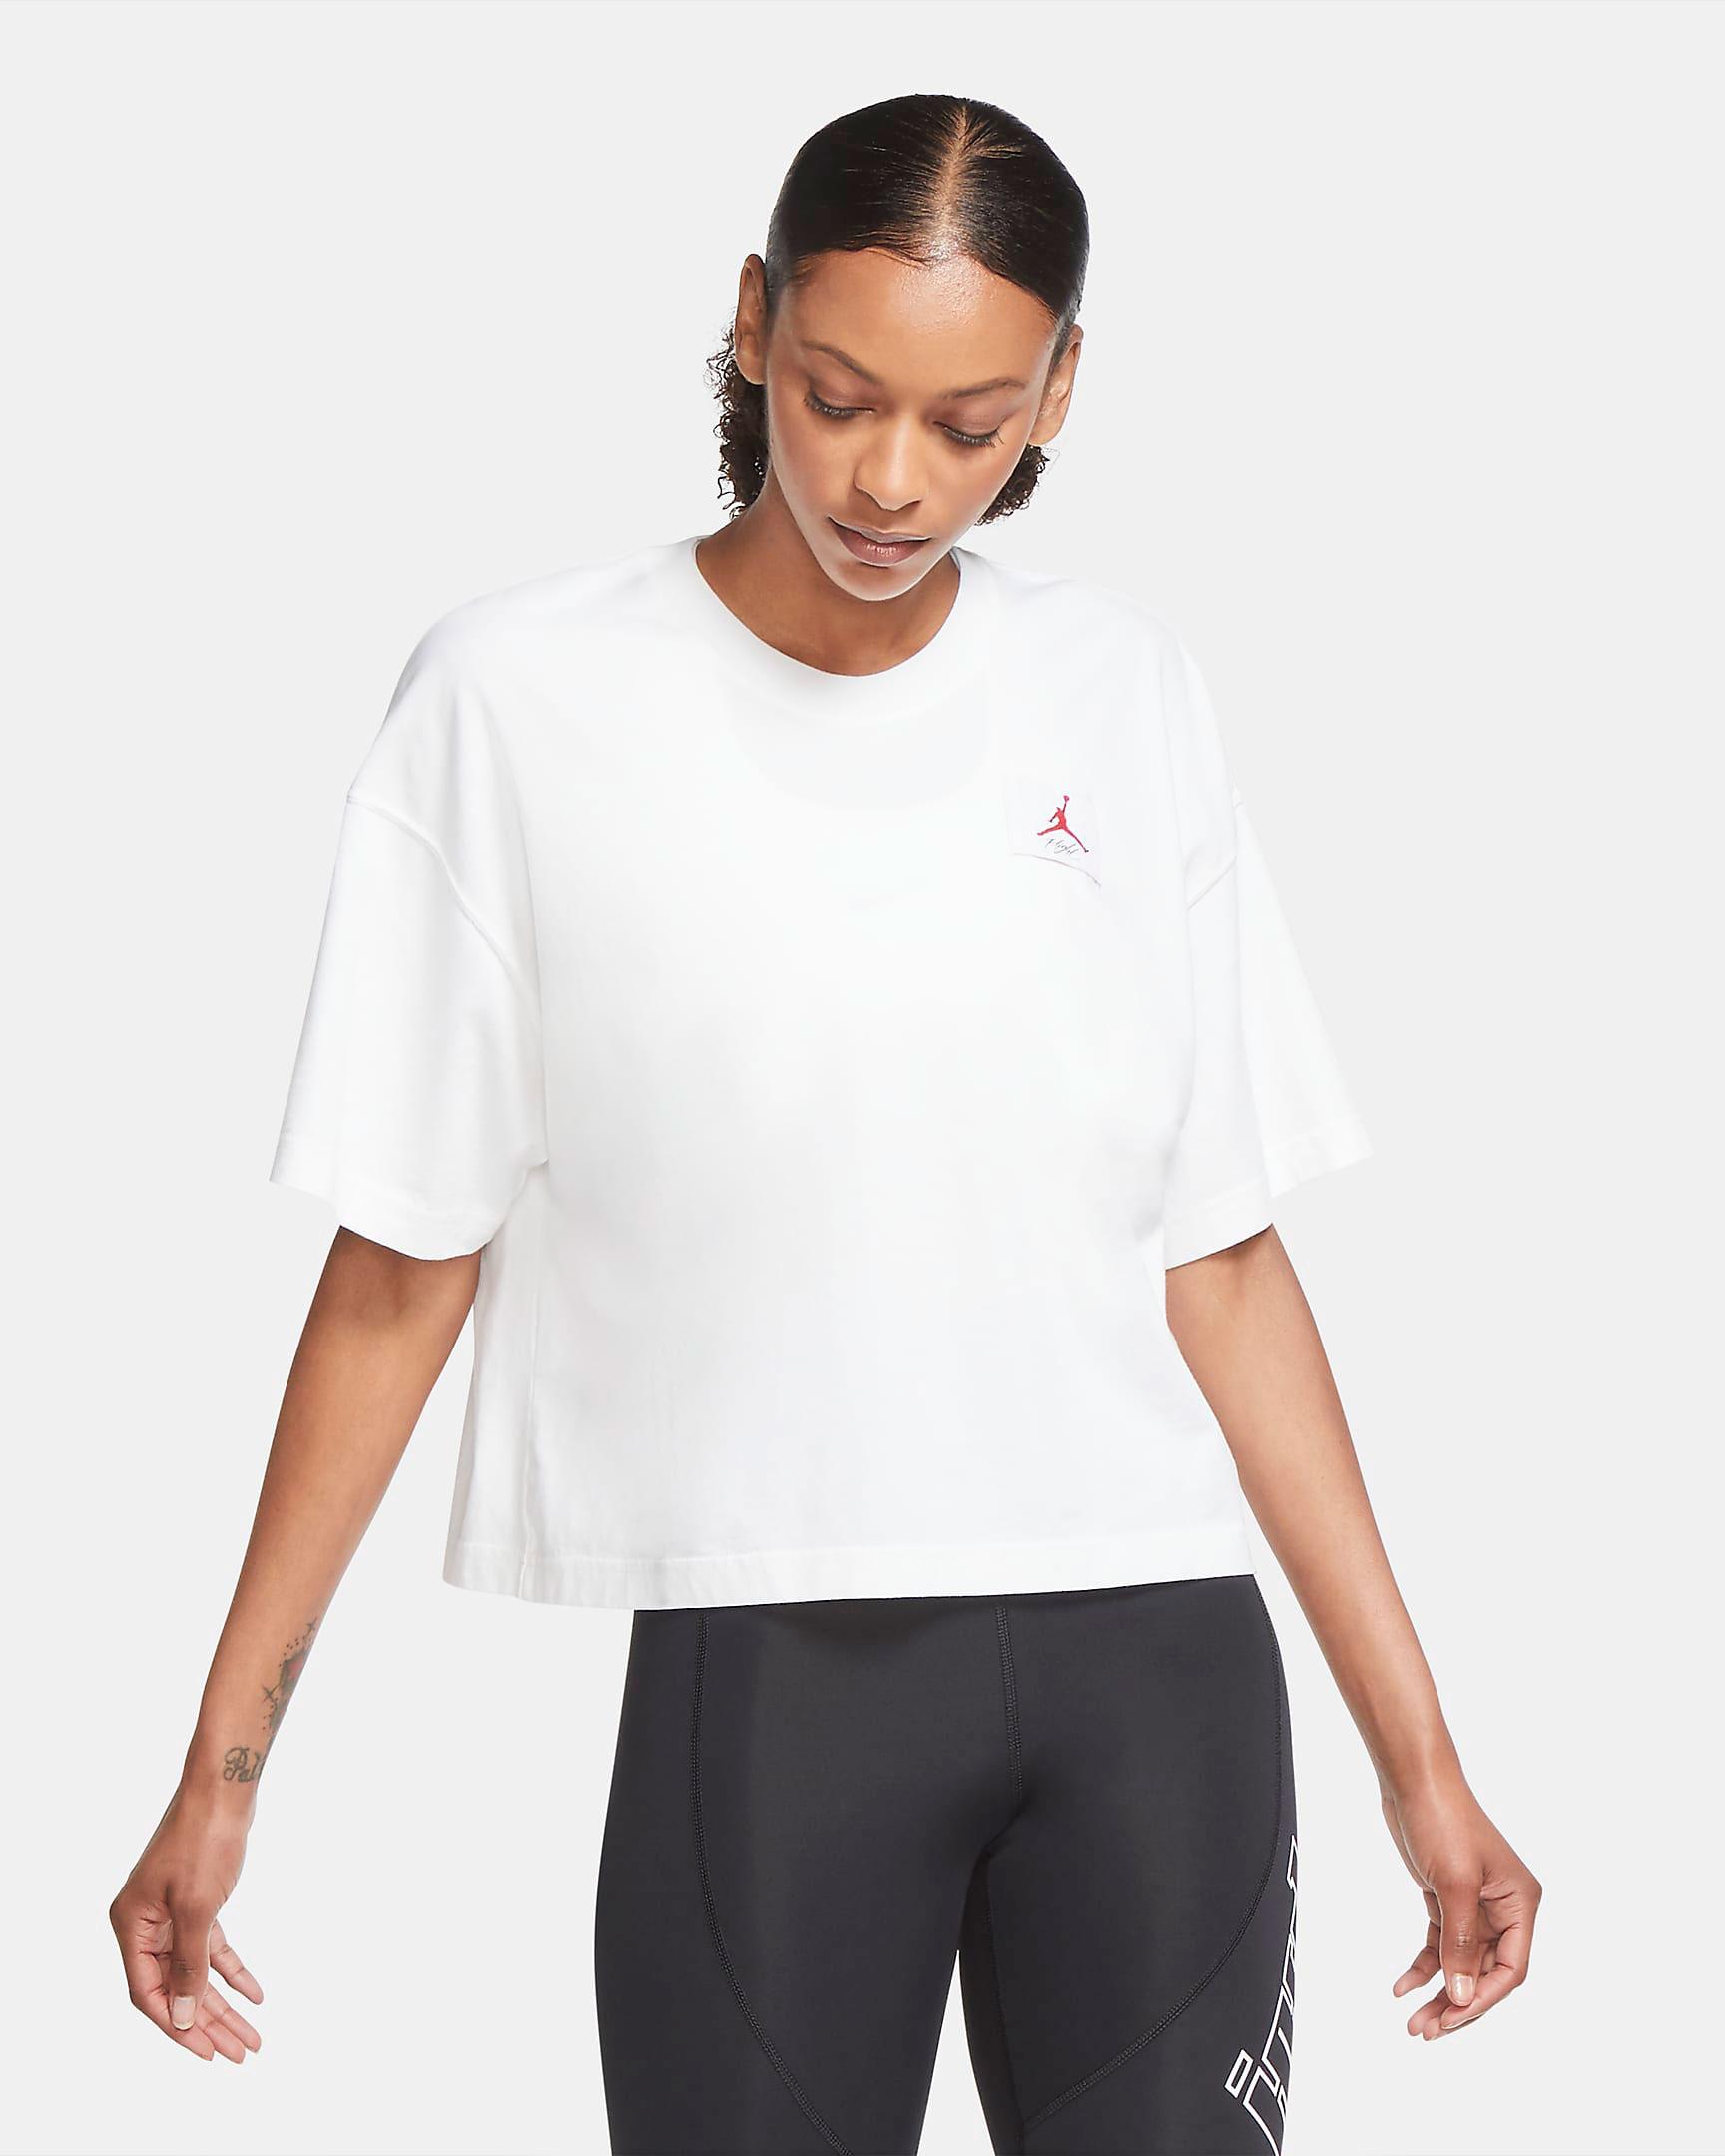 jordan-womens-flight-shirt-white